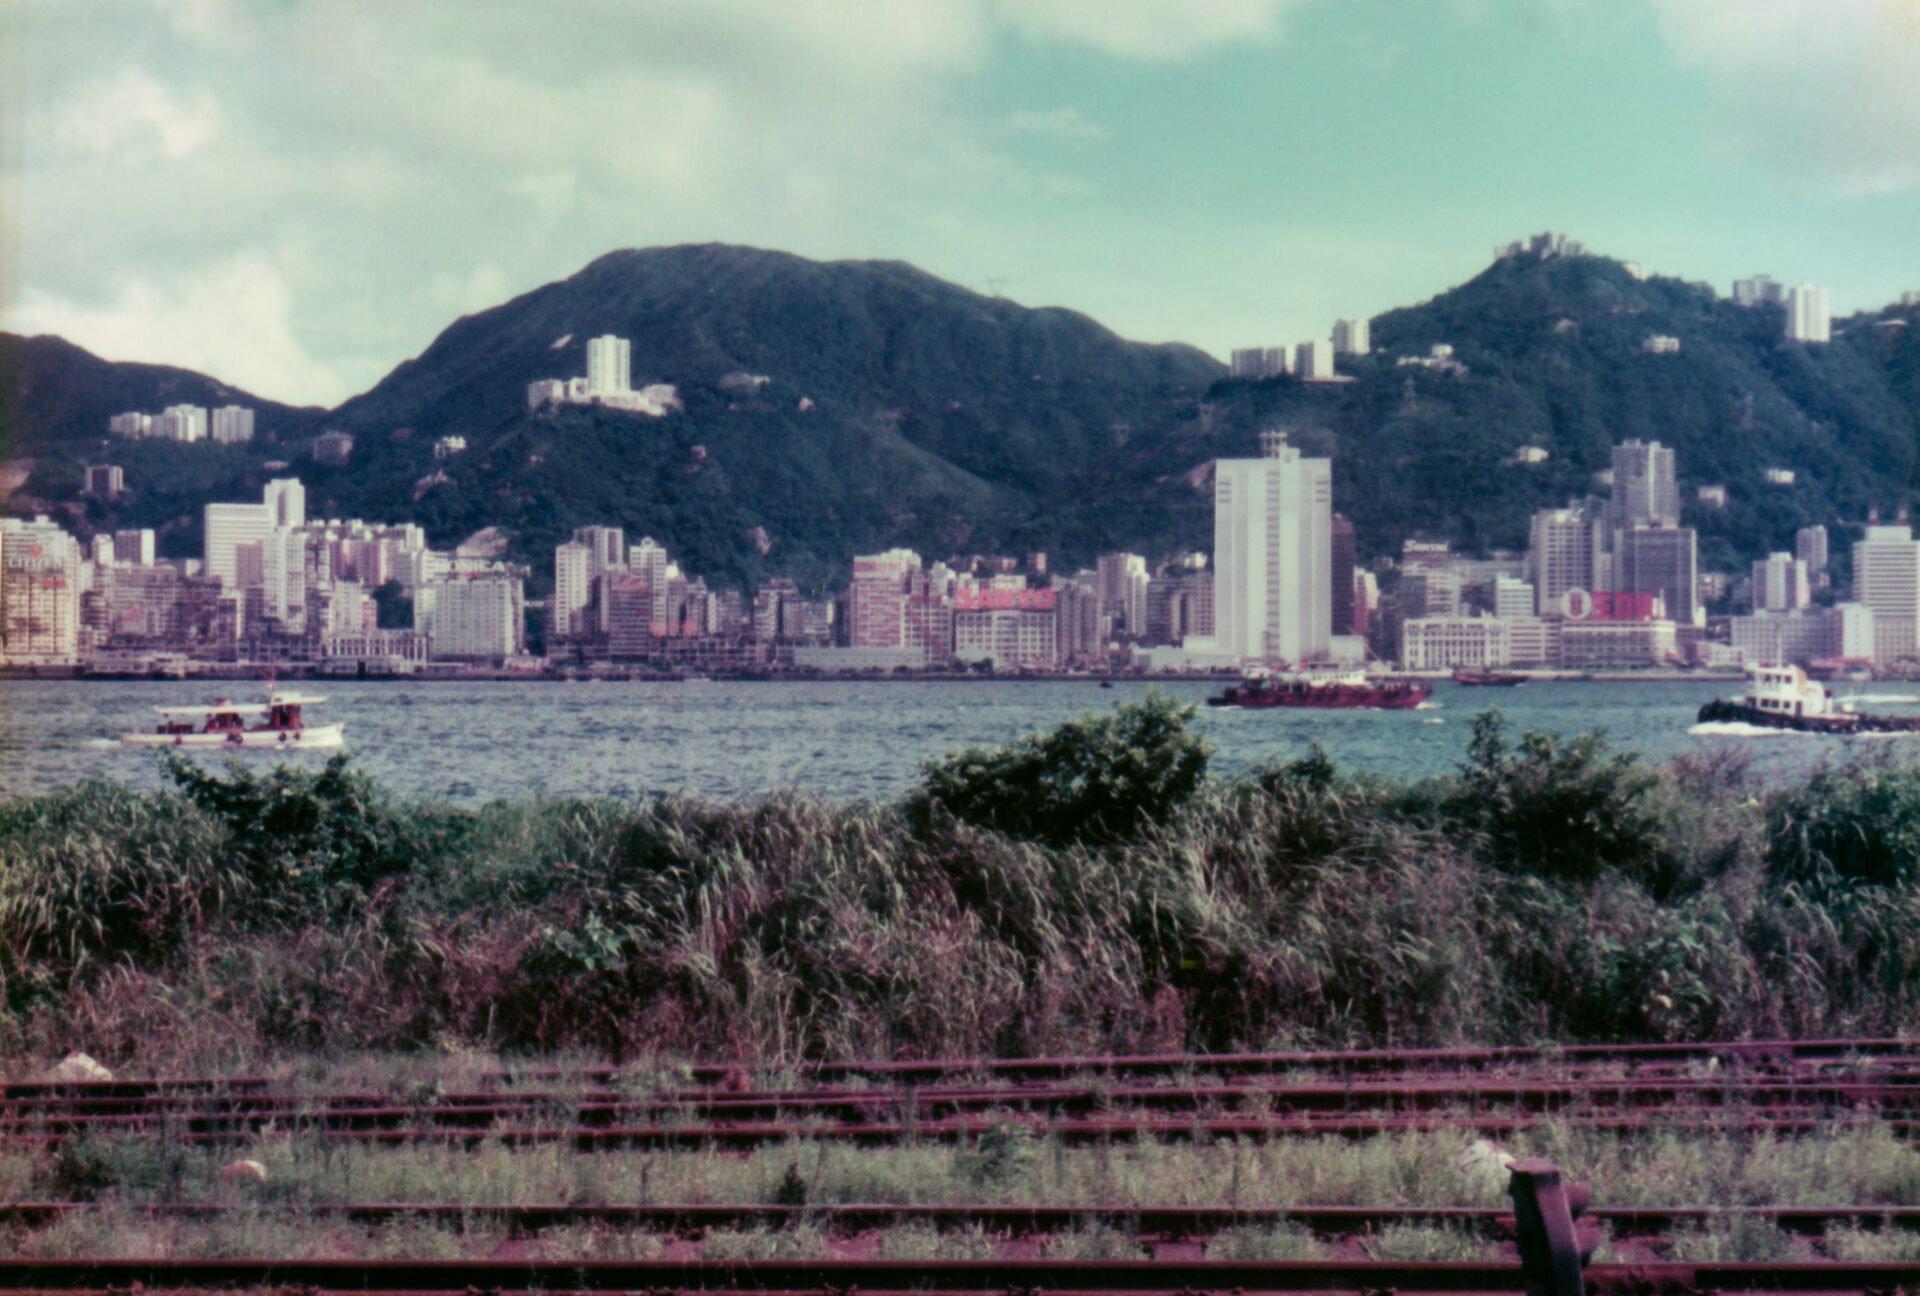 Hong Kong of causway bay and wanchai from Kowloon station